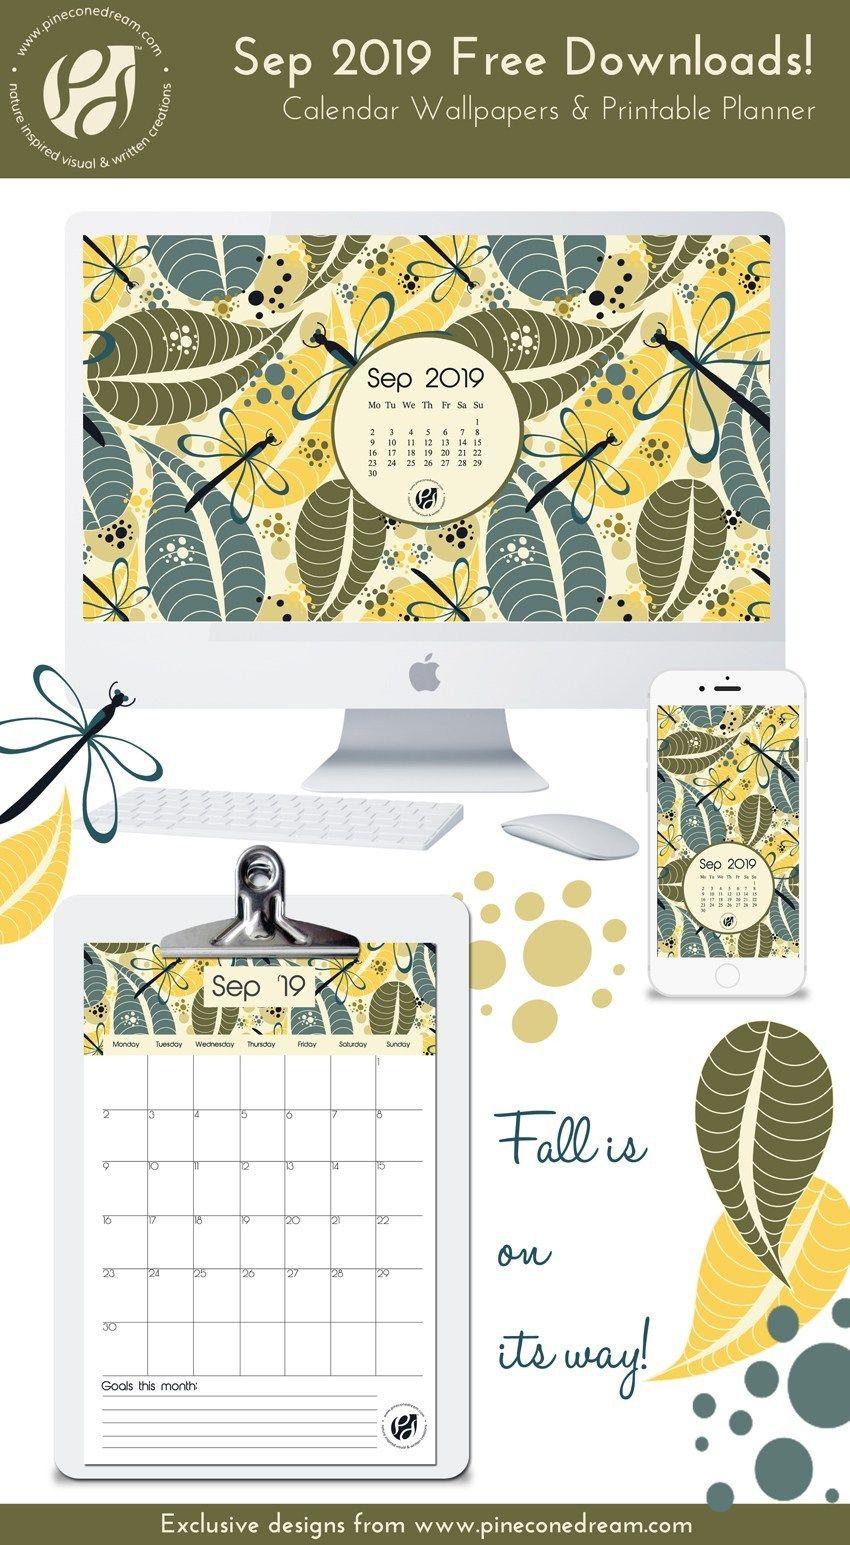 September 2019 free calendar wallpapers & printable